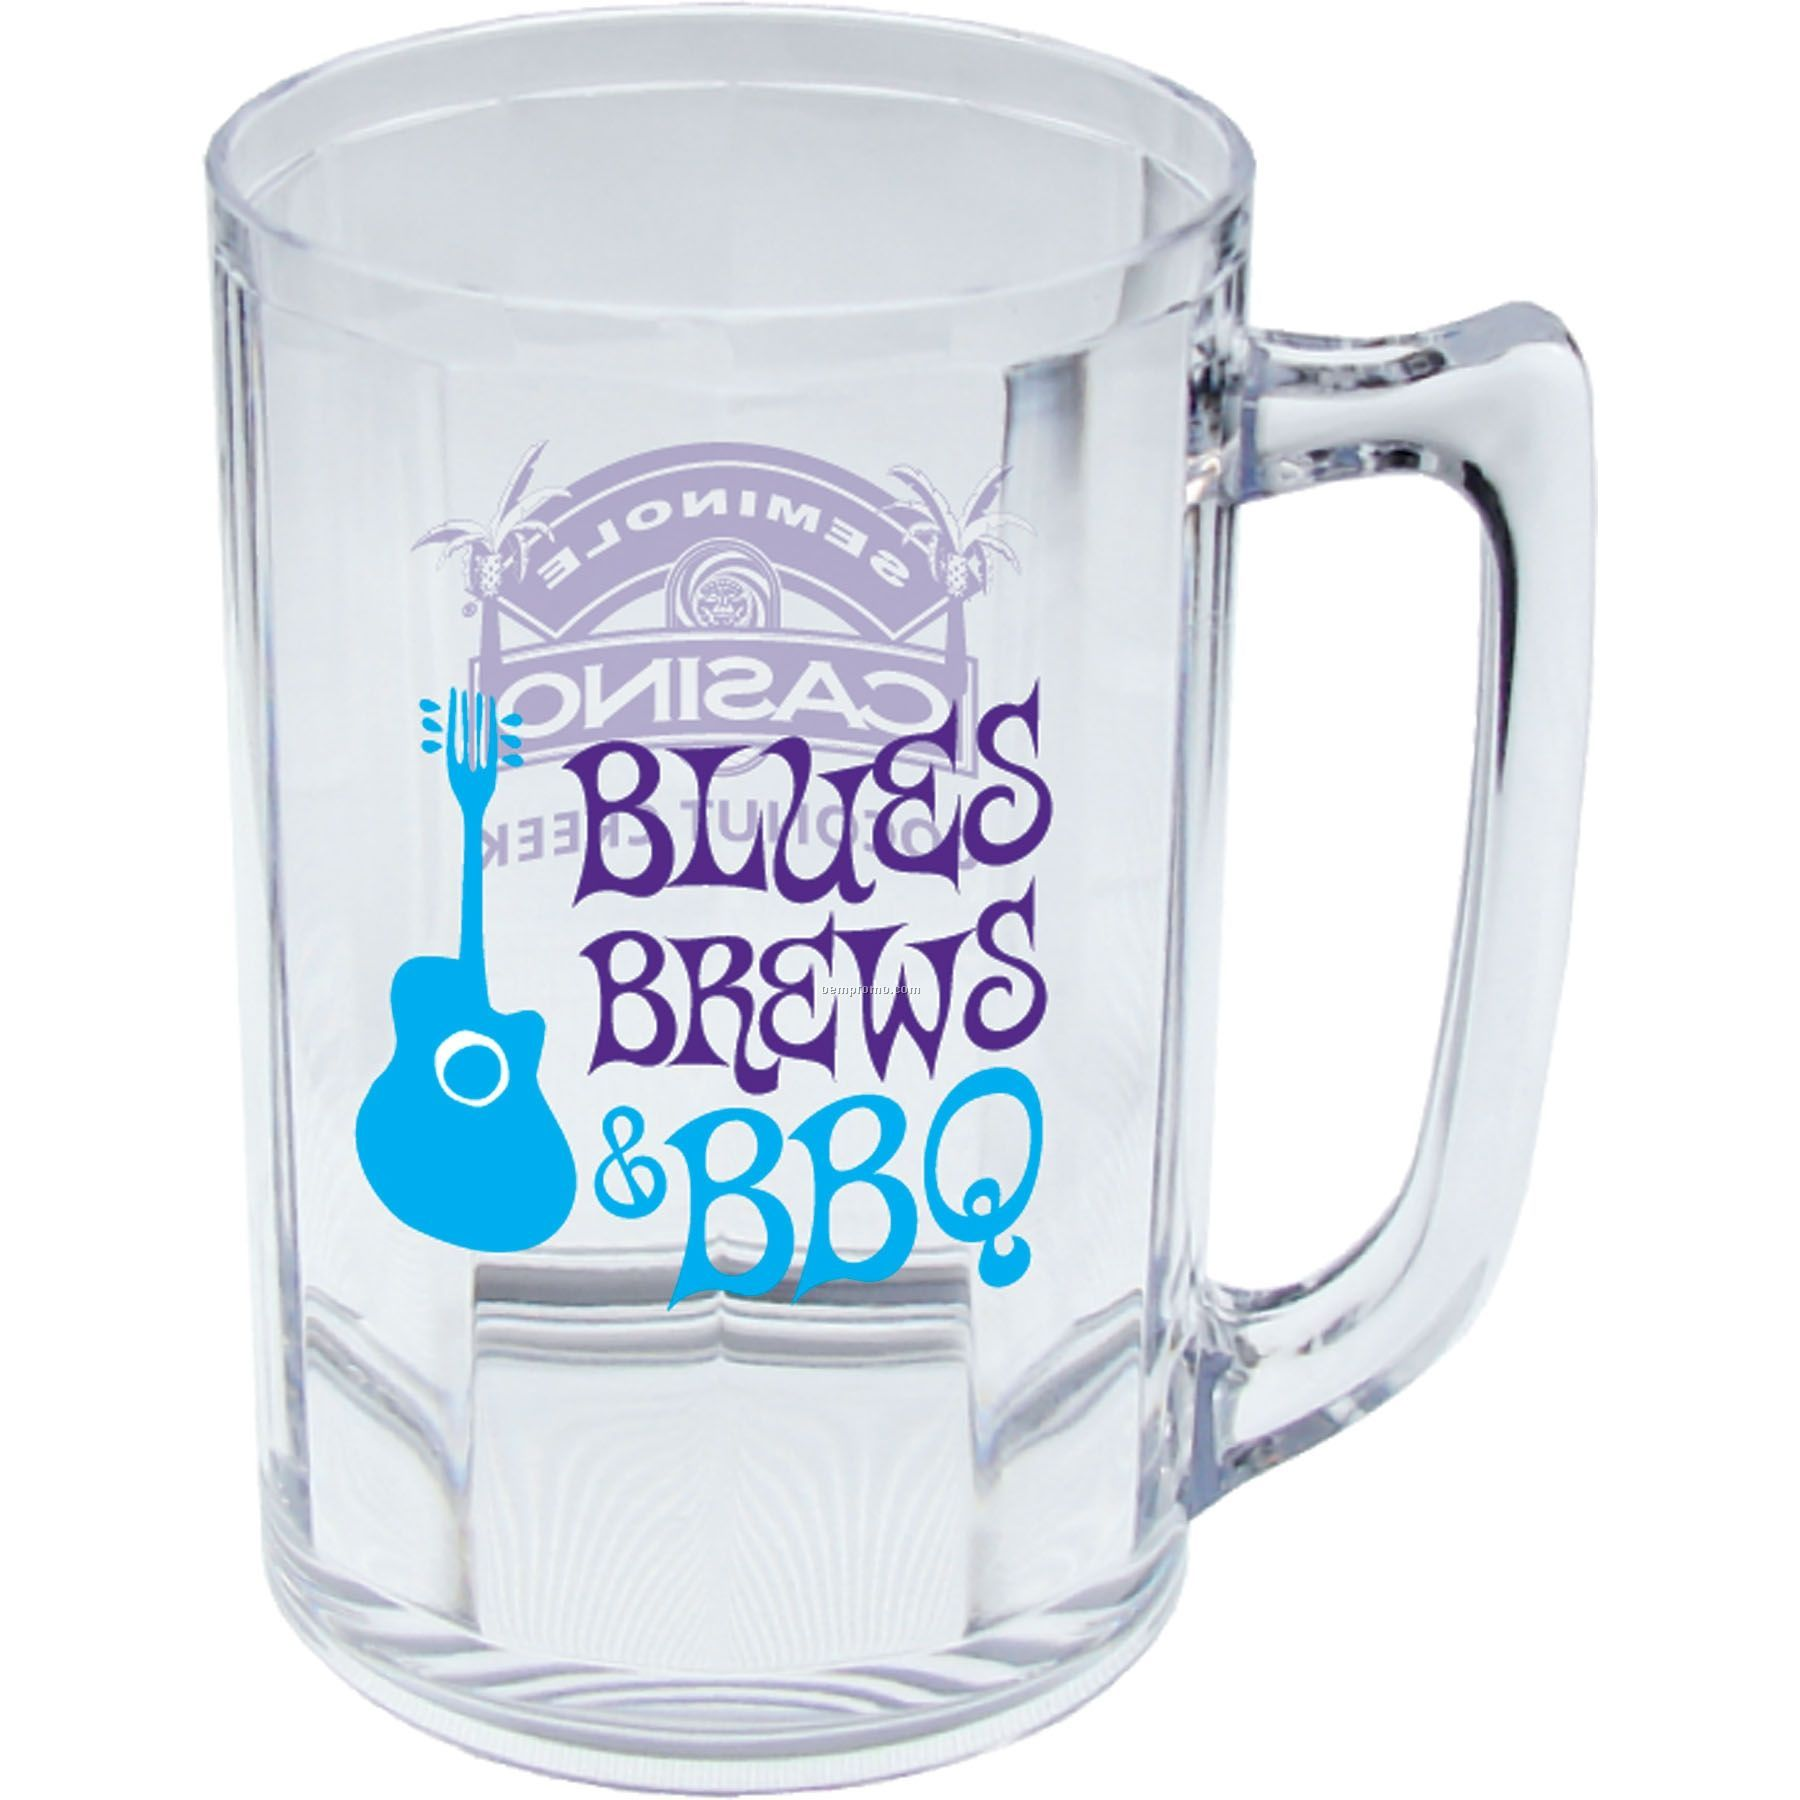 5 Oz. Styrene Beer Mug